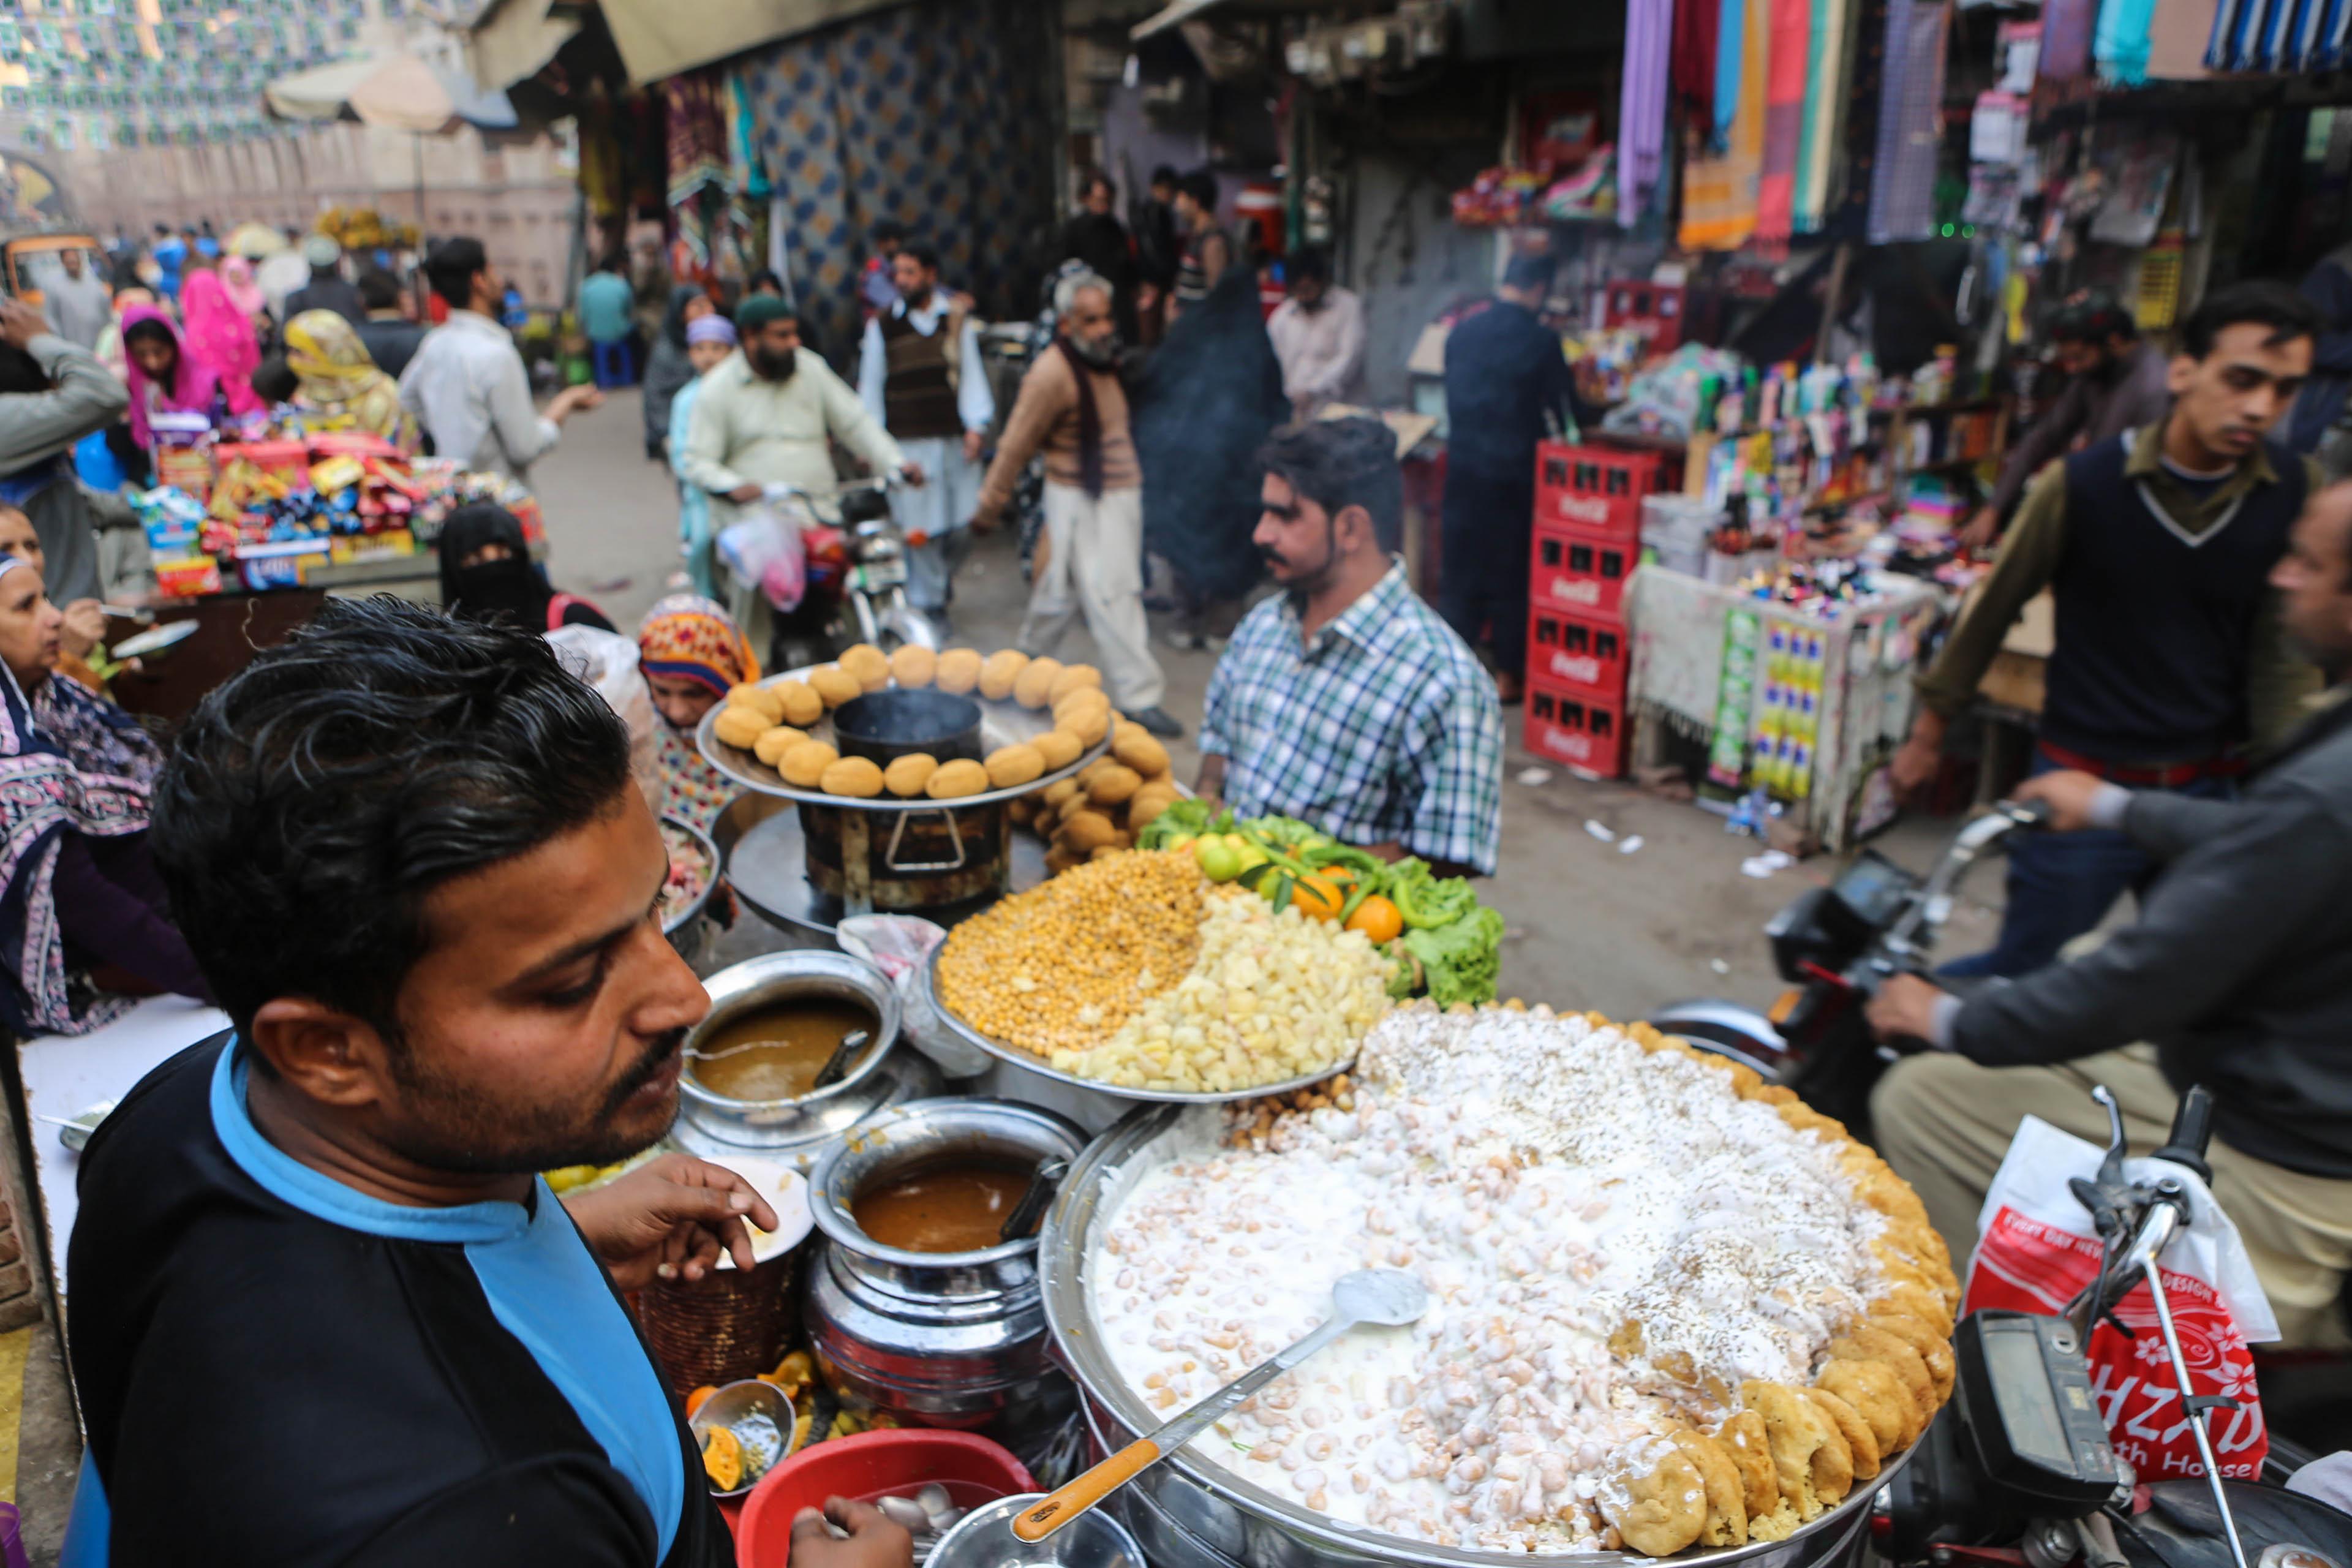 Pakistan: mat, dryck och starkare stimuli